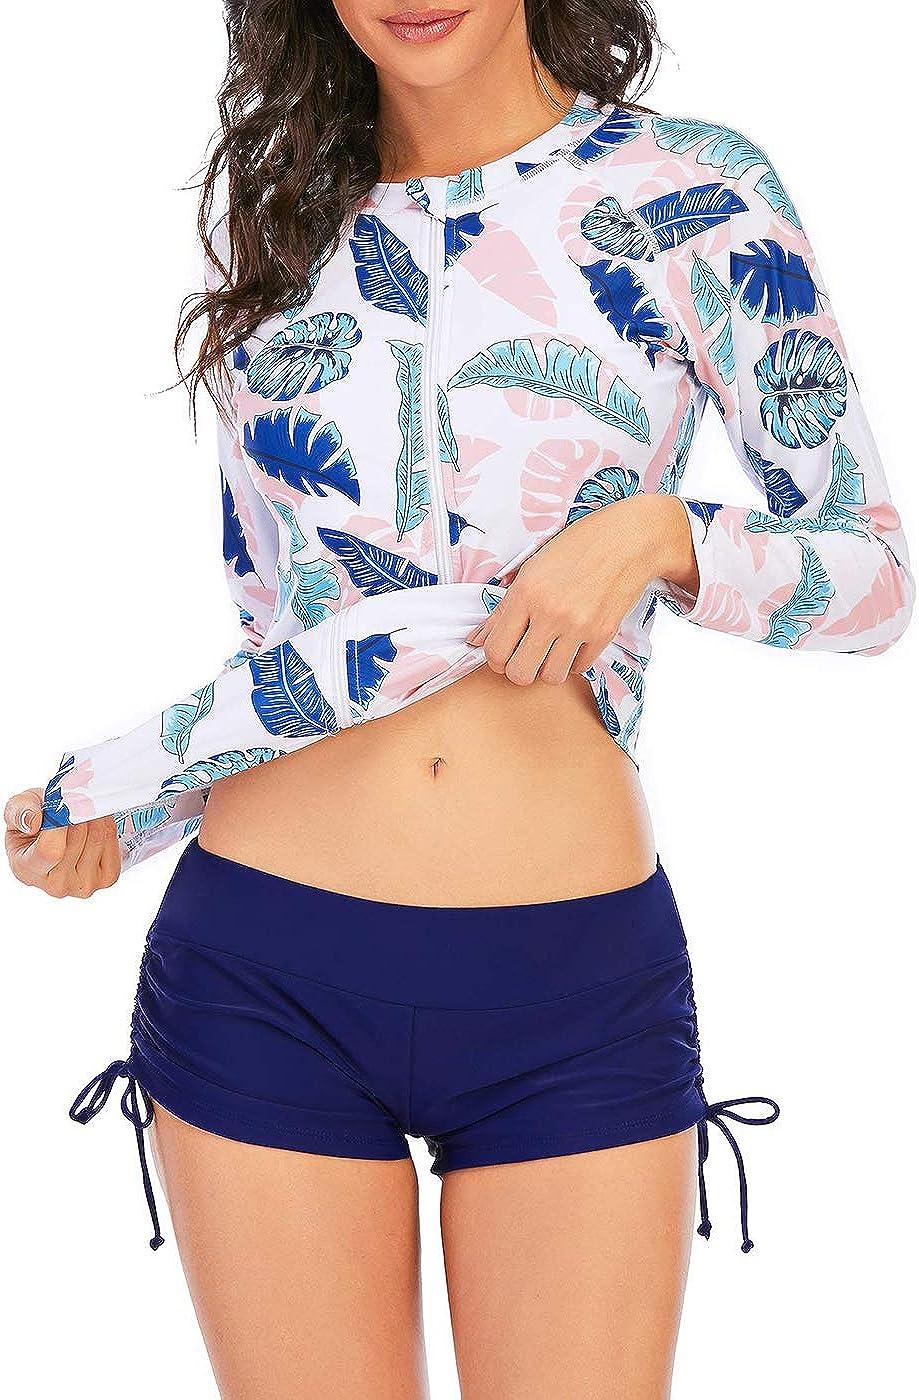 Zando Women Rash Guard Long Sleeve Swimsuits UV UPF 50+ Swim Shirts Bathing Suit Athletic Tankini Set